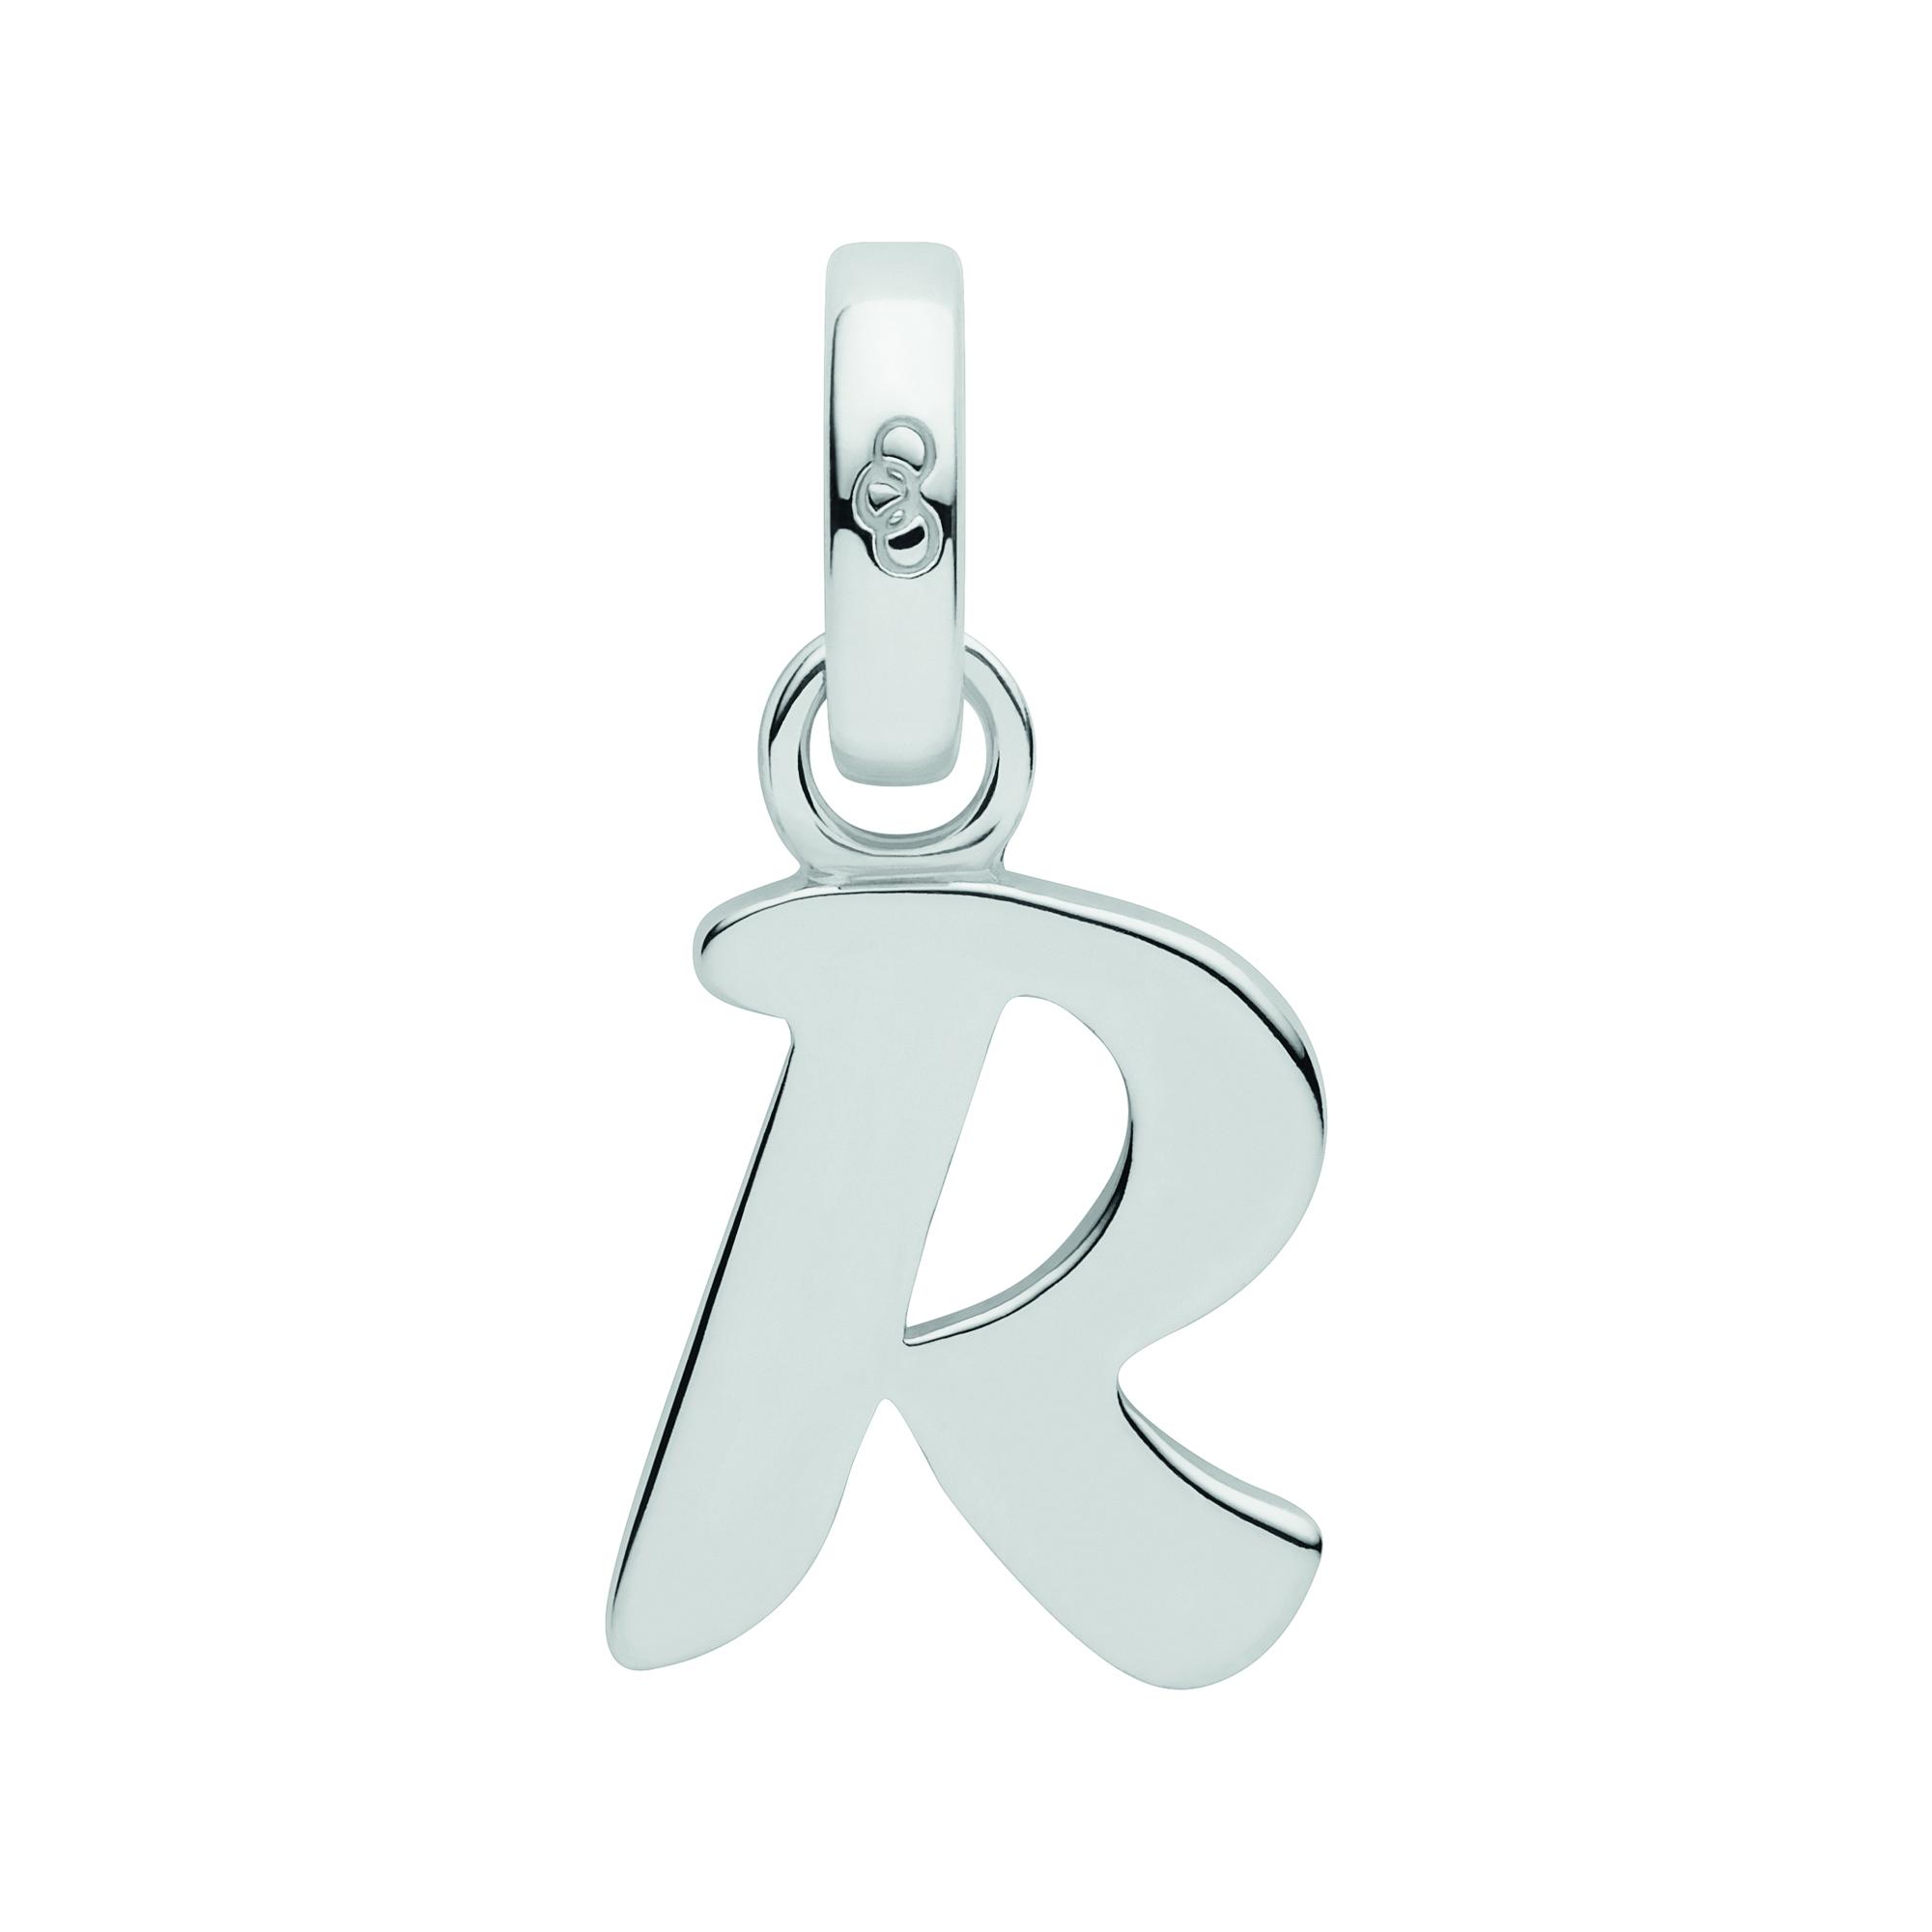 LINKS OF LONDON - Ασημένιο γούρι Alphabet Charms R γυναικεία αξεσουάρ κοσμήματα παντατίφ